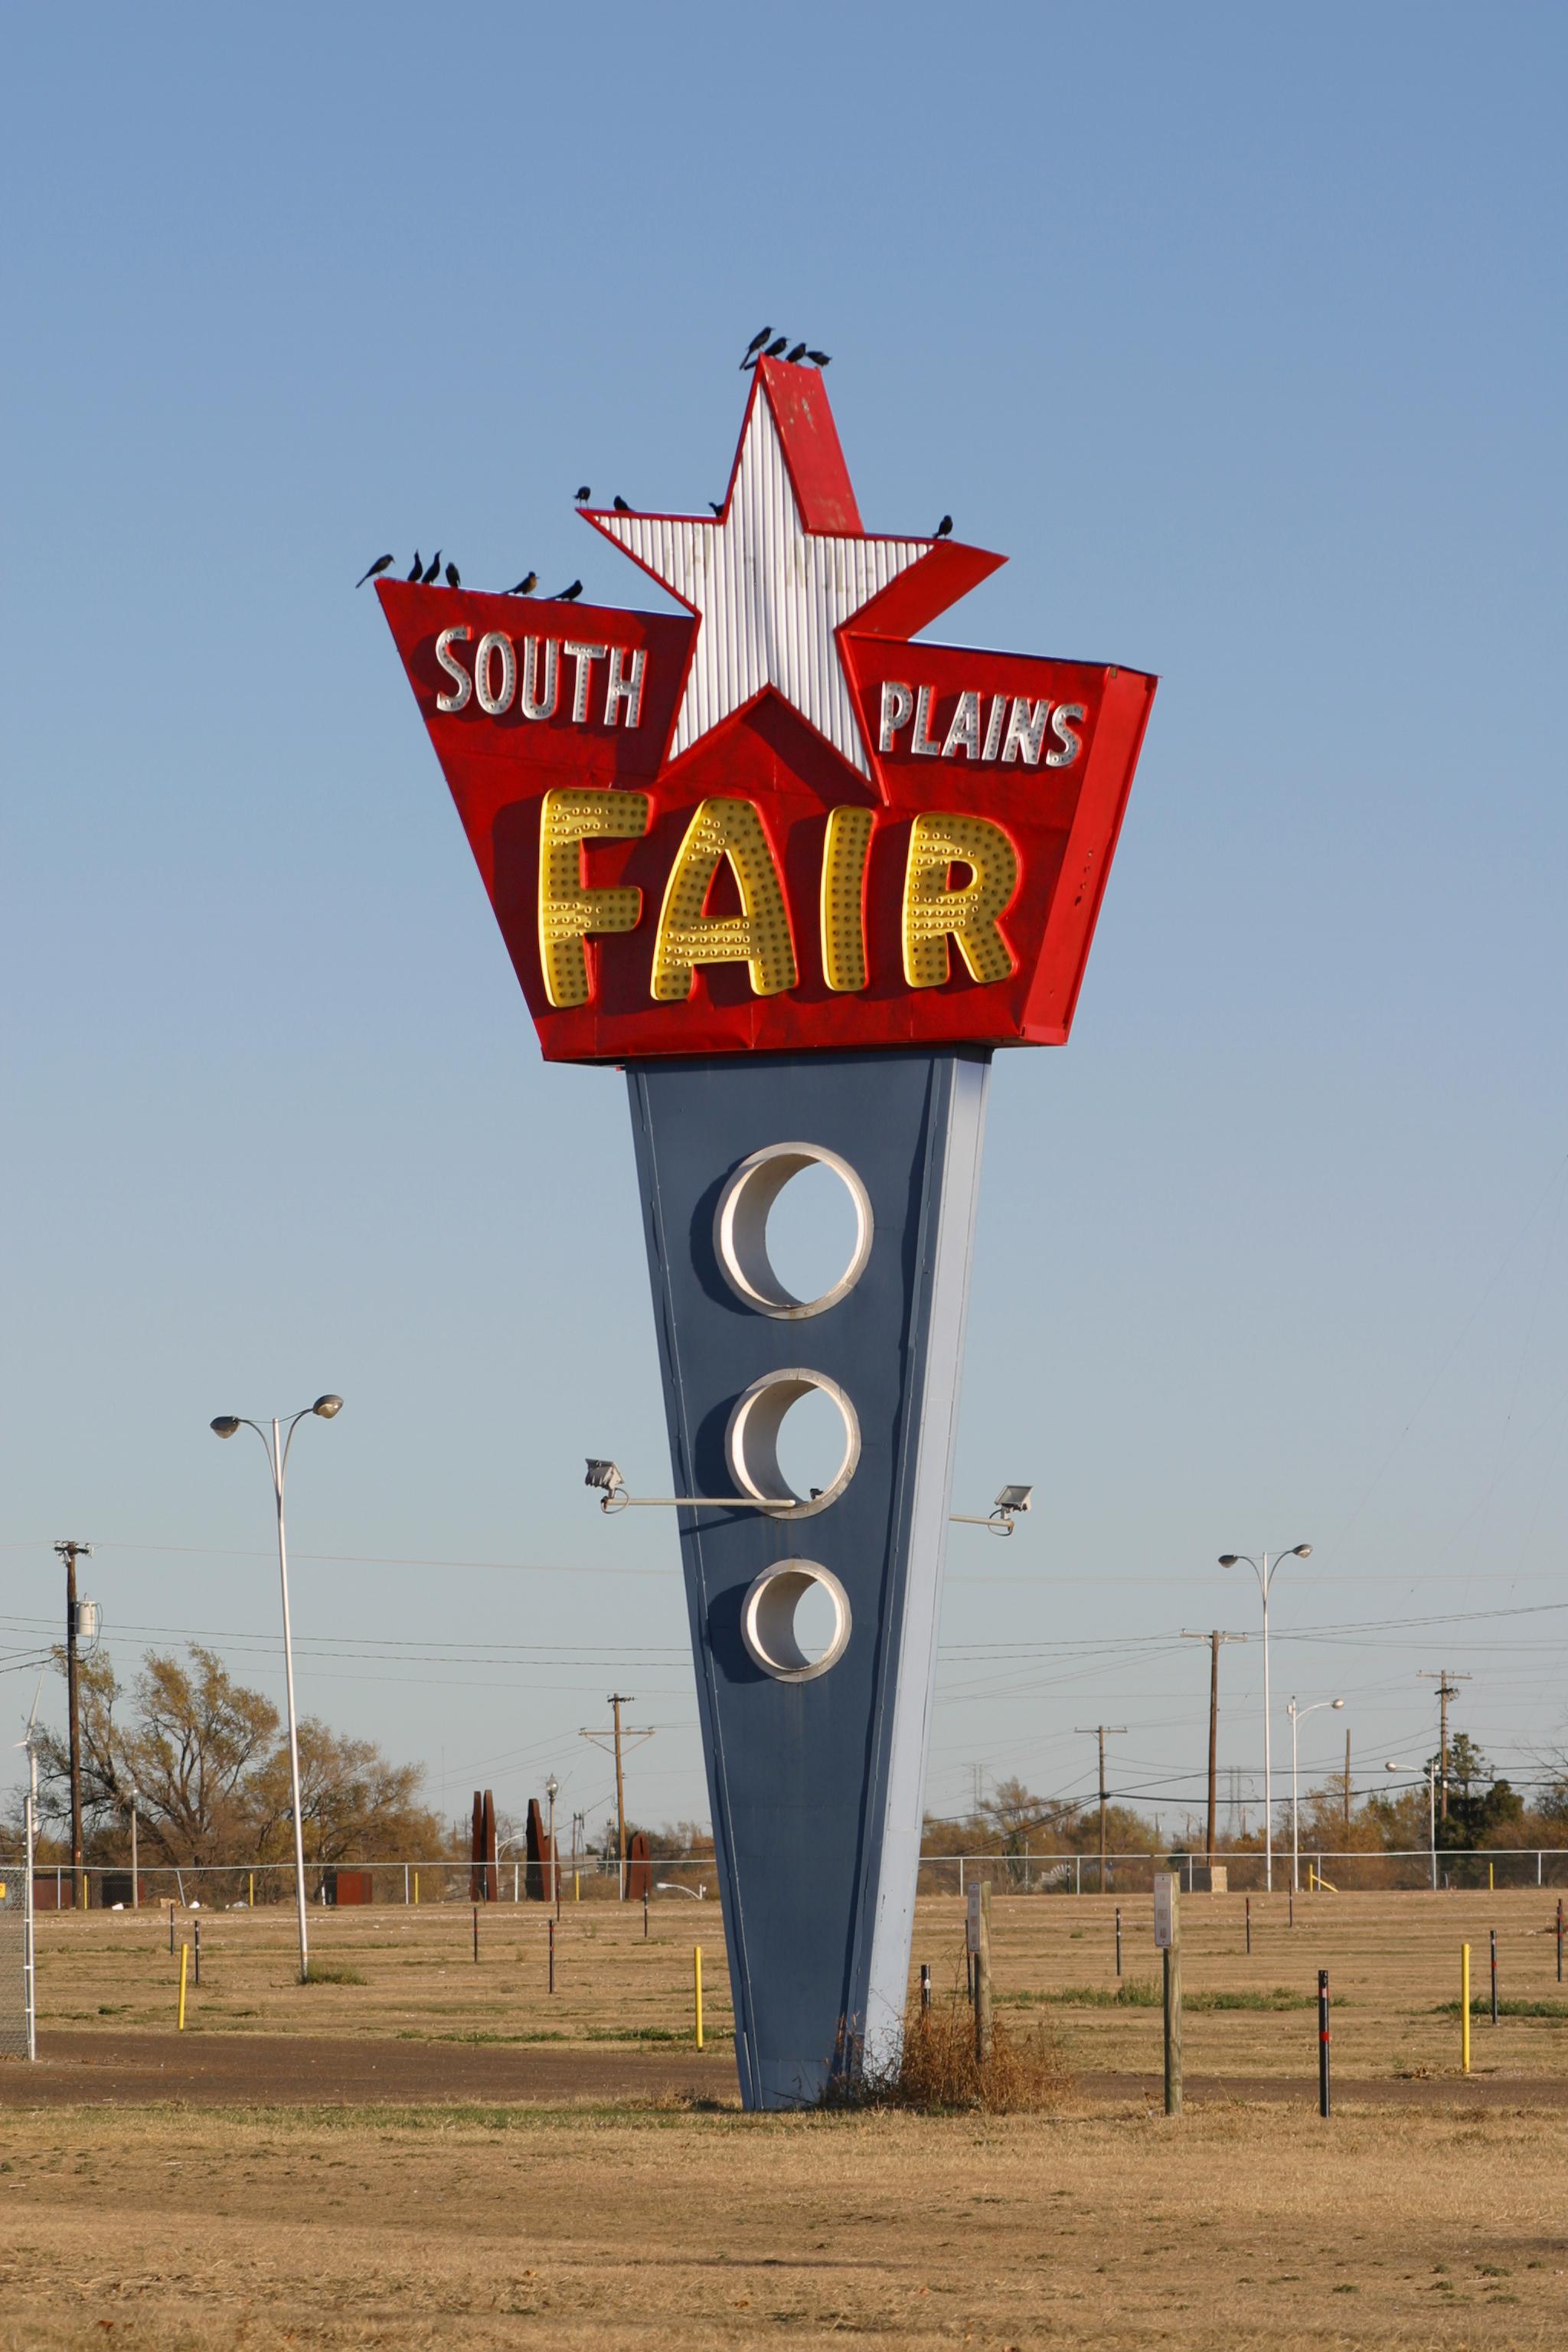 South Plains - Wikipedia